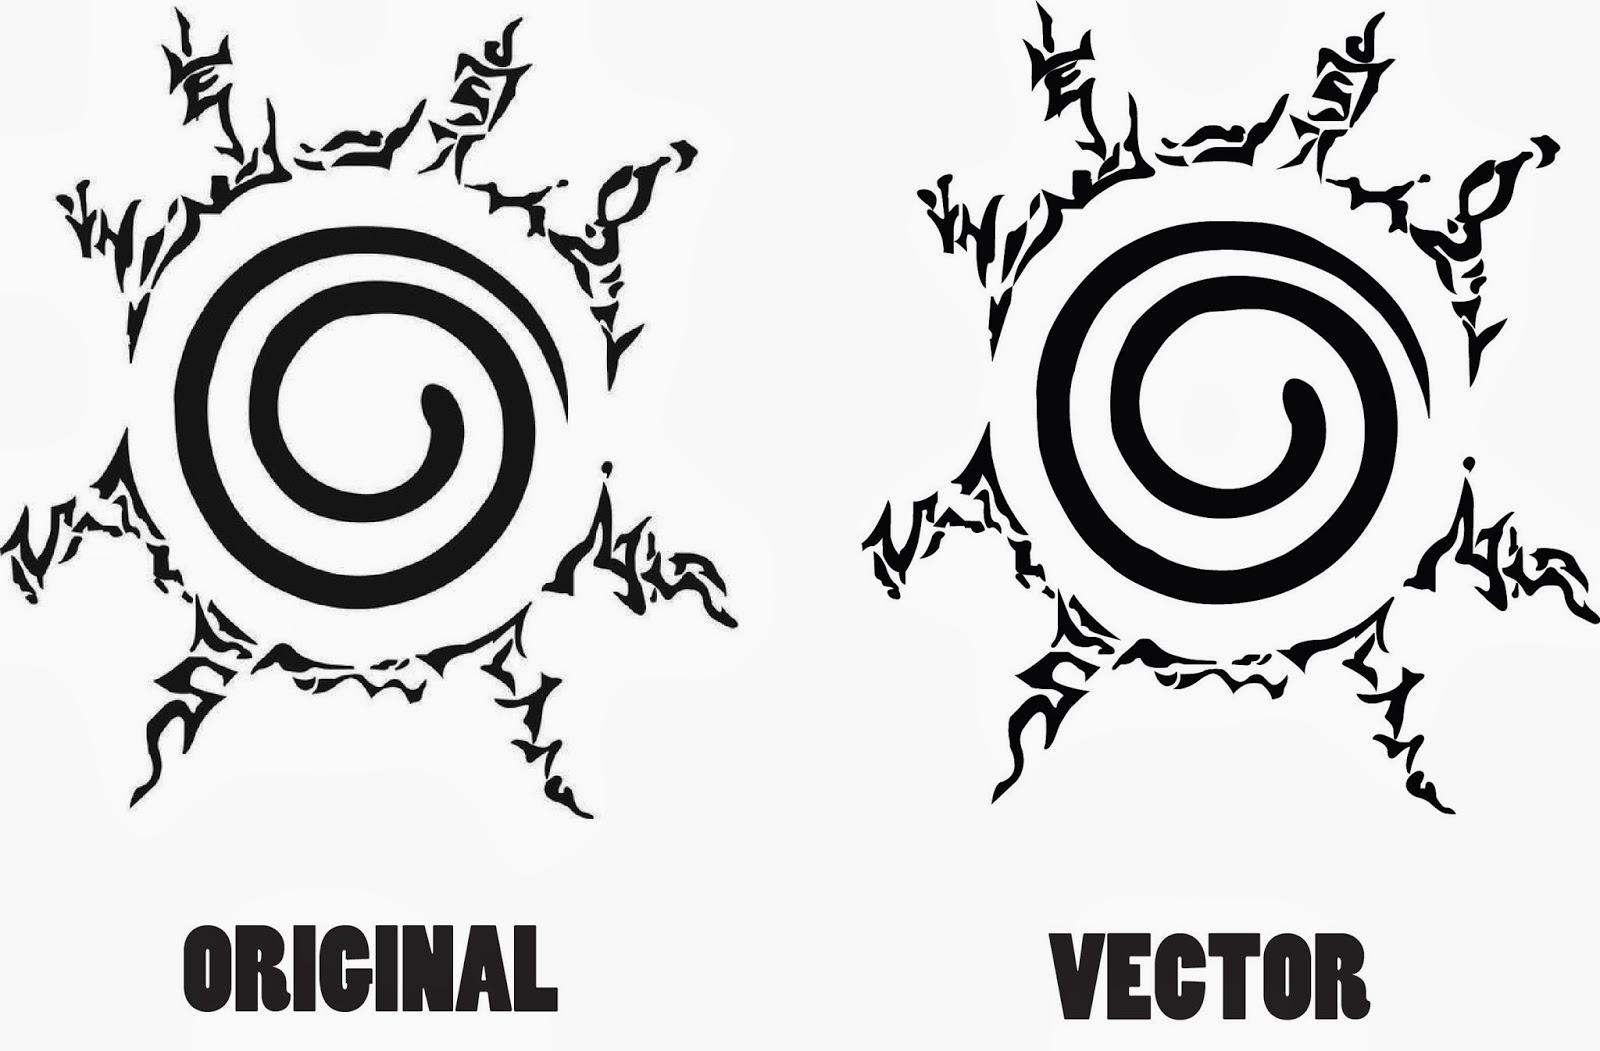 Graphic Design: Basic Computer